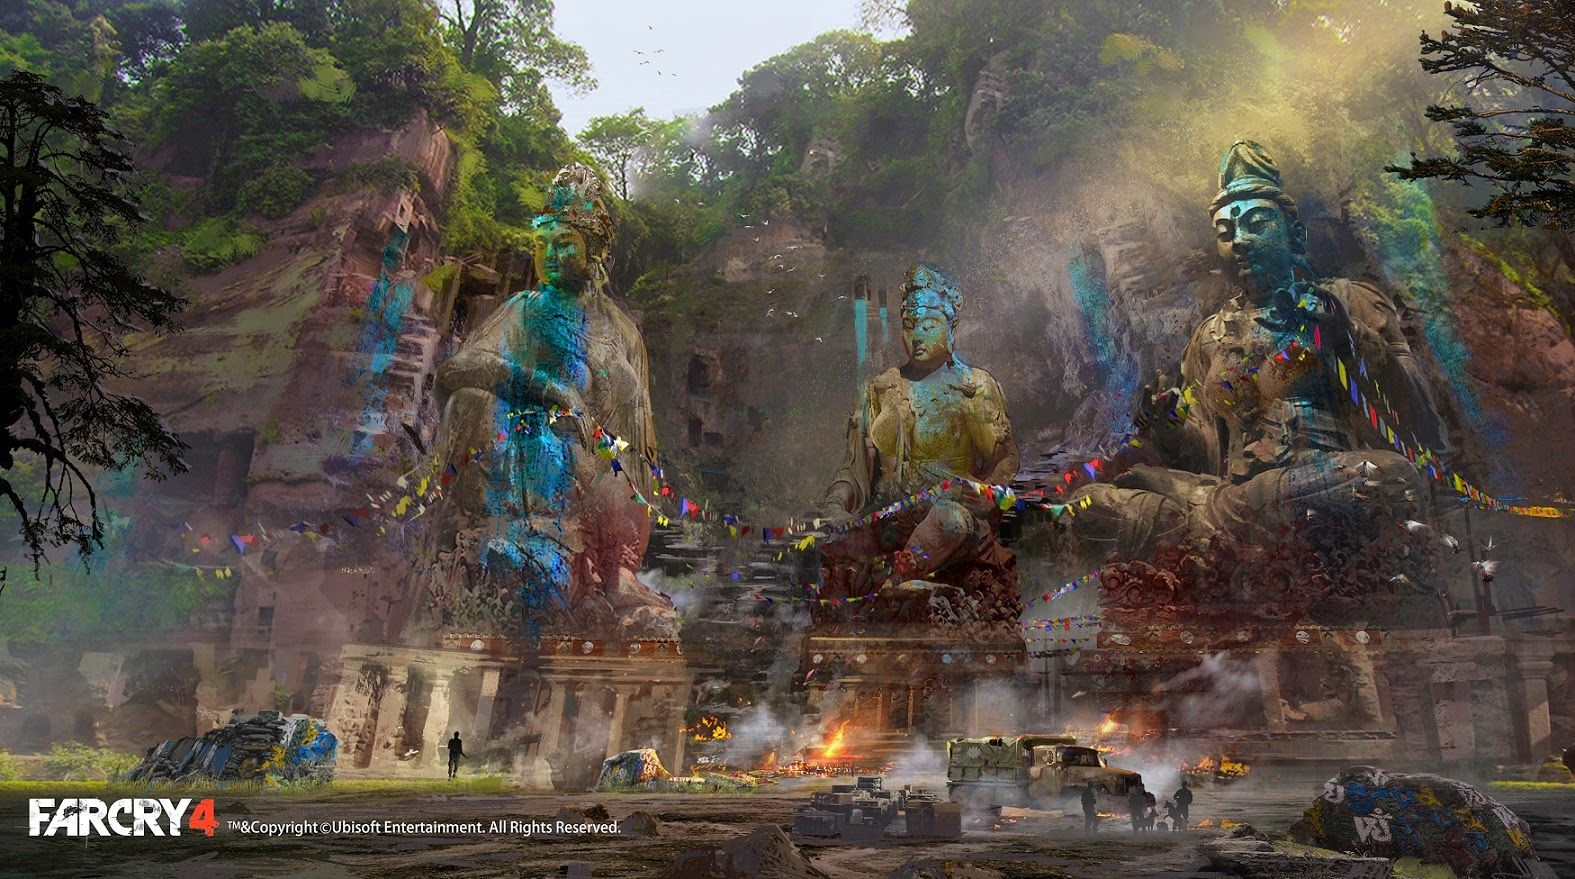 The Beautiful Art Of Far Cry 4 Concept Art World Environment Concept Art Game Concept Art